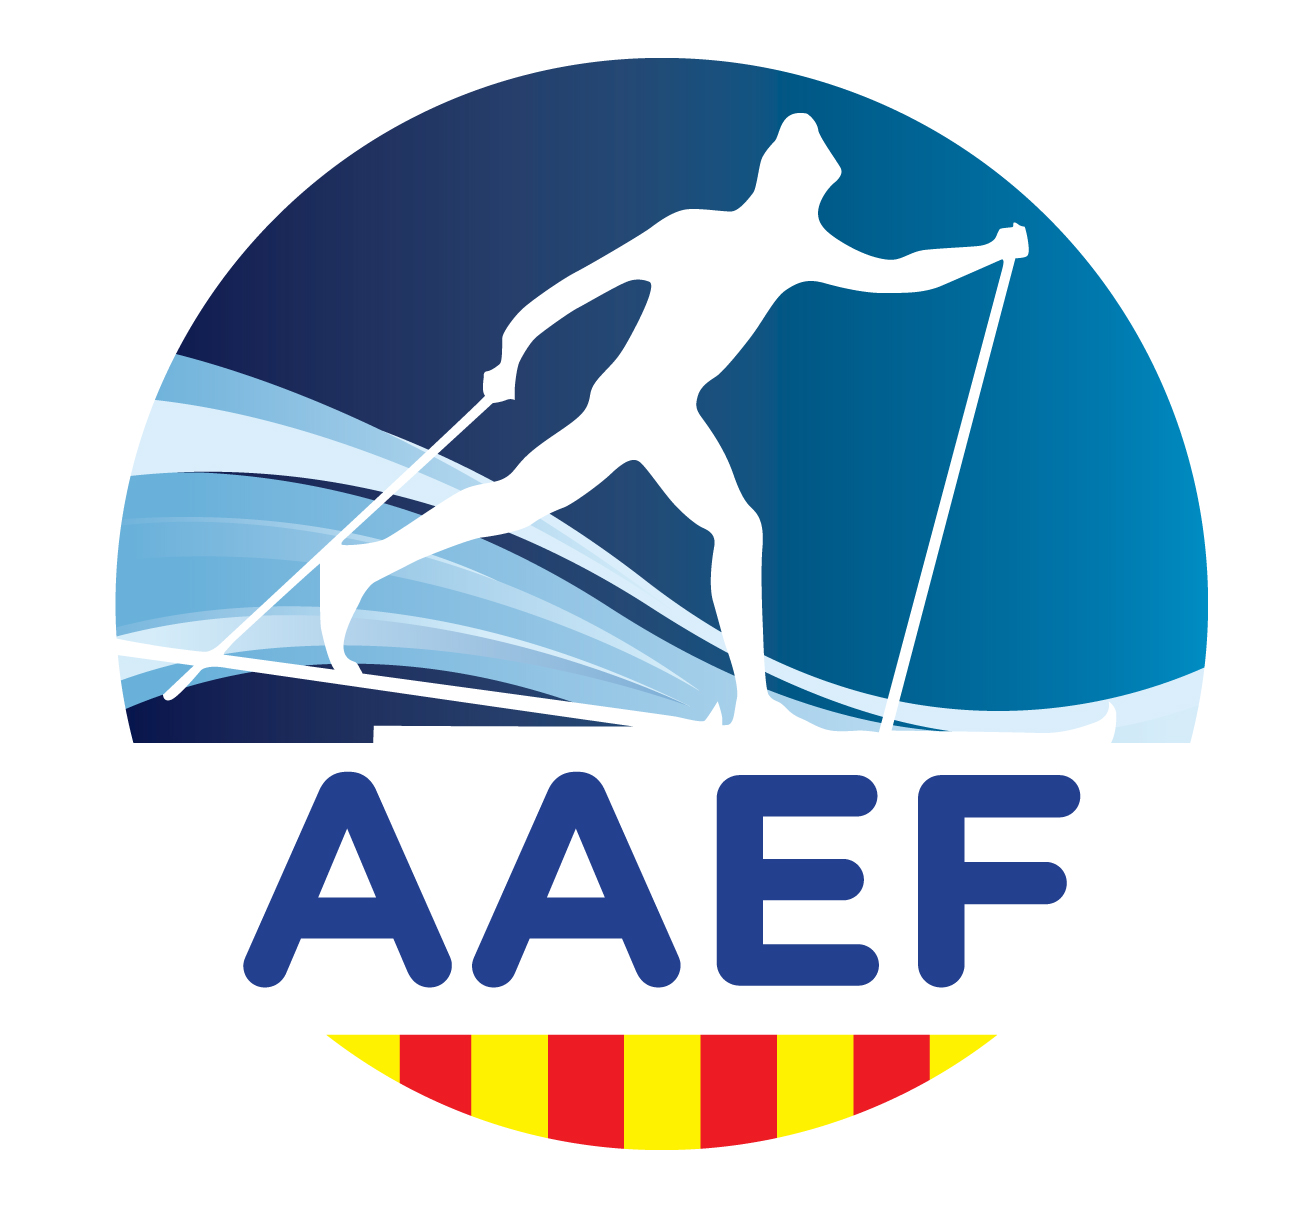 AAEF_10cm.2